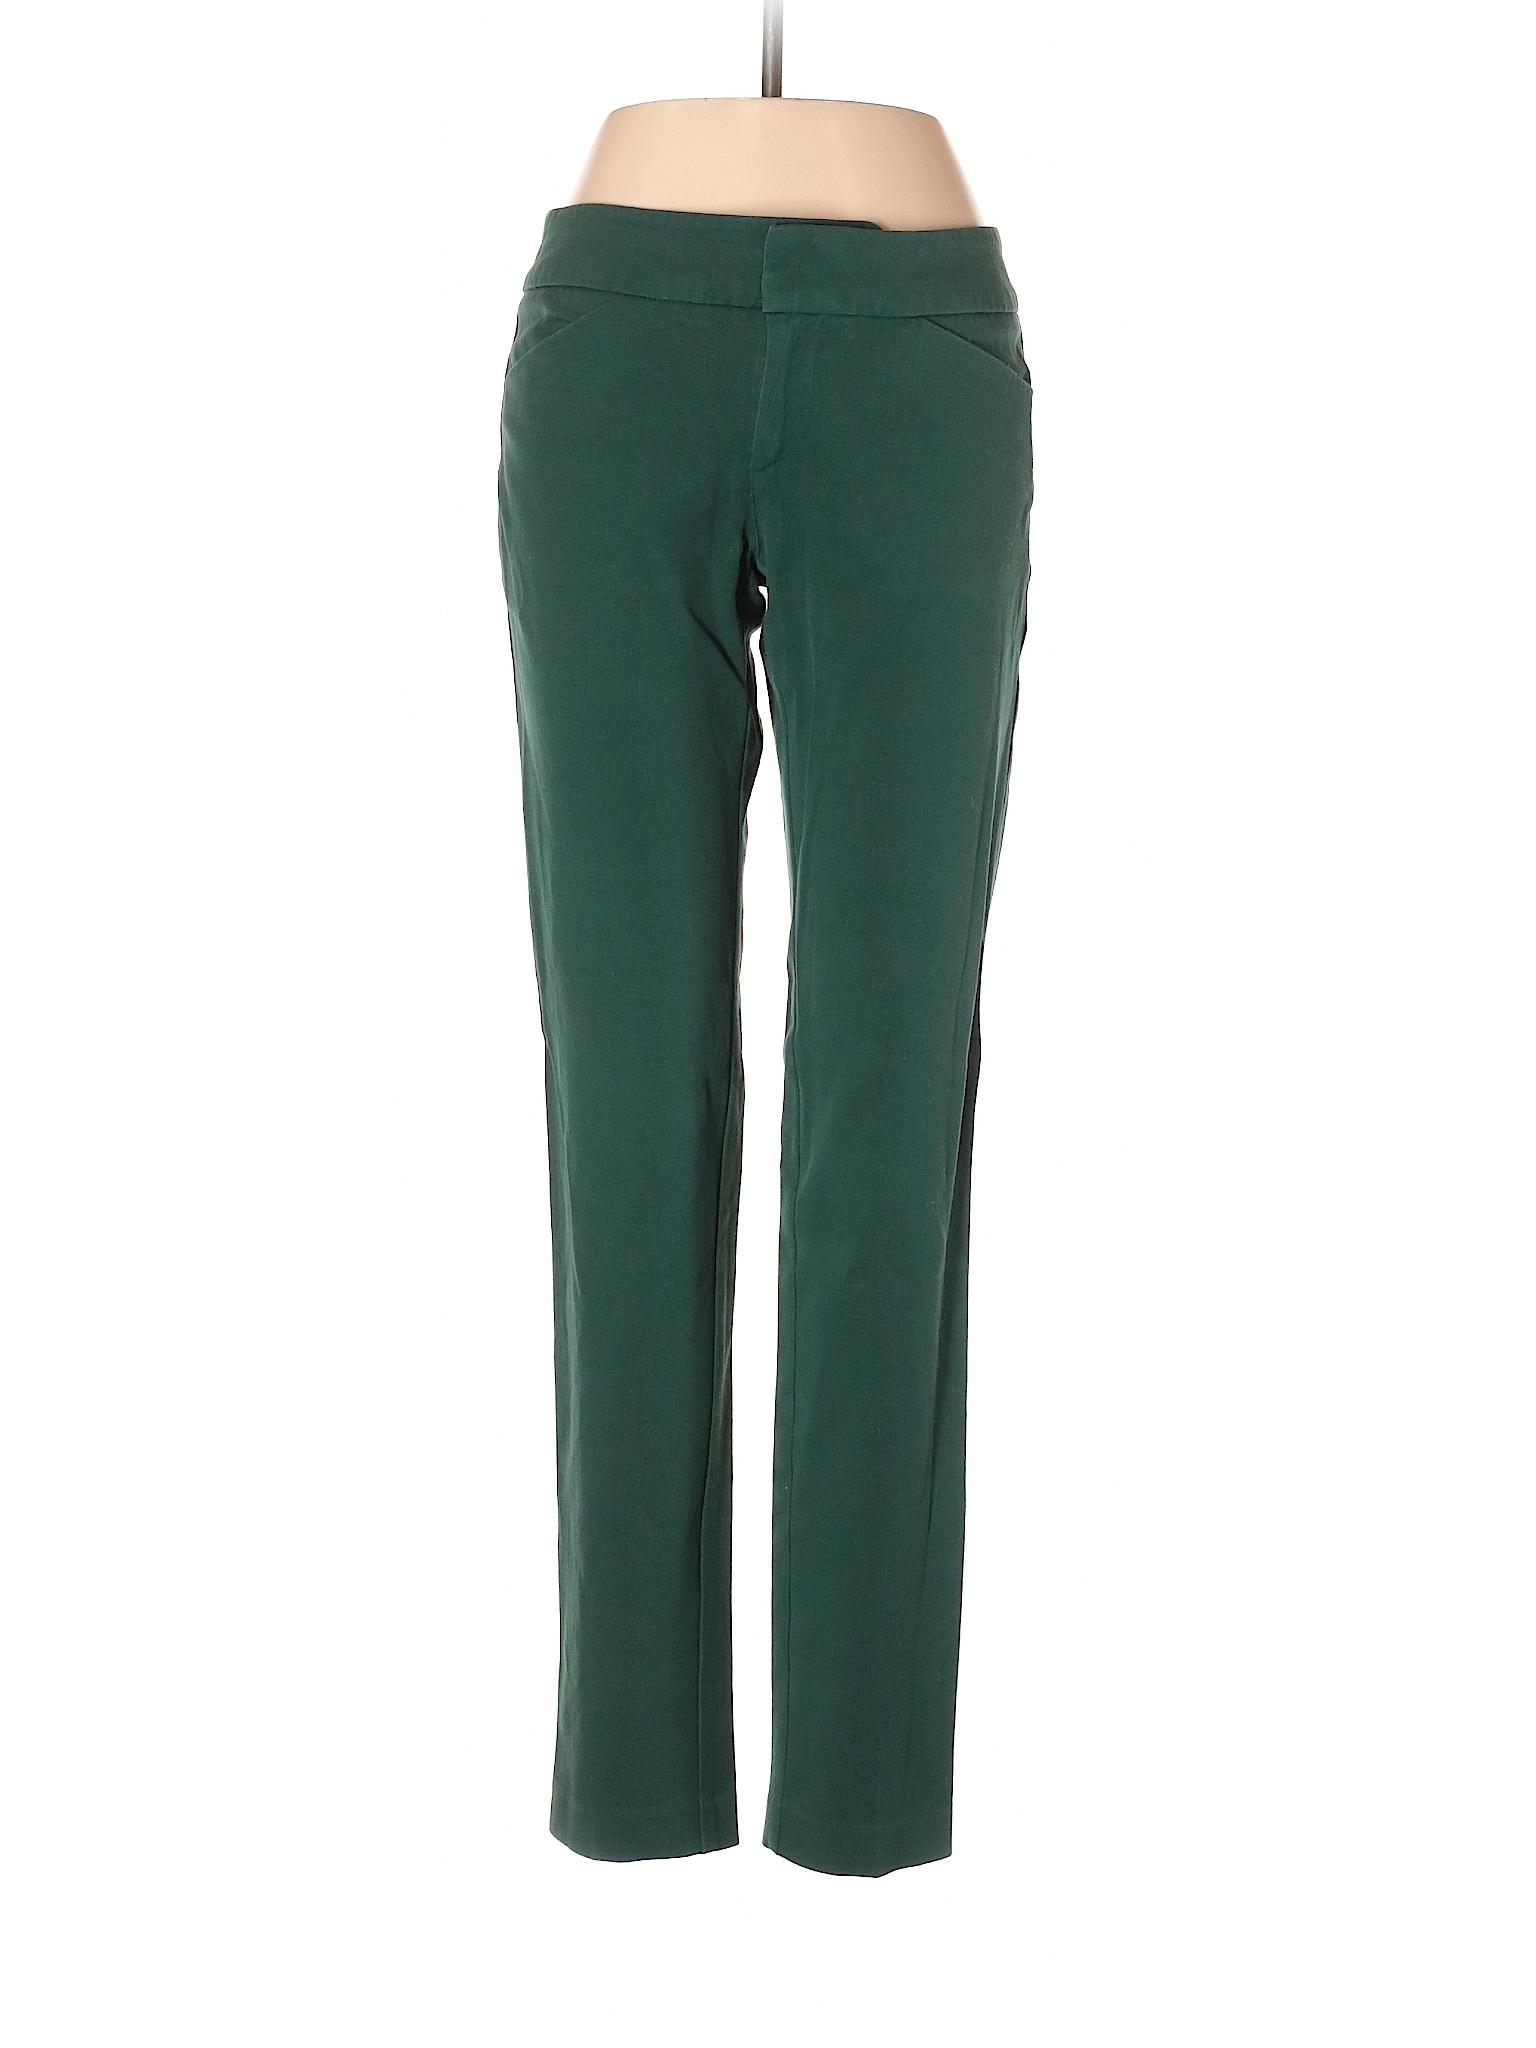 Cynthia Rowley Tjx Solid Dark Green Casual Pants Size 2